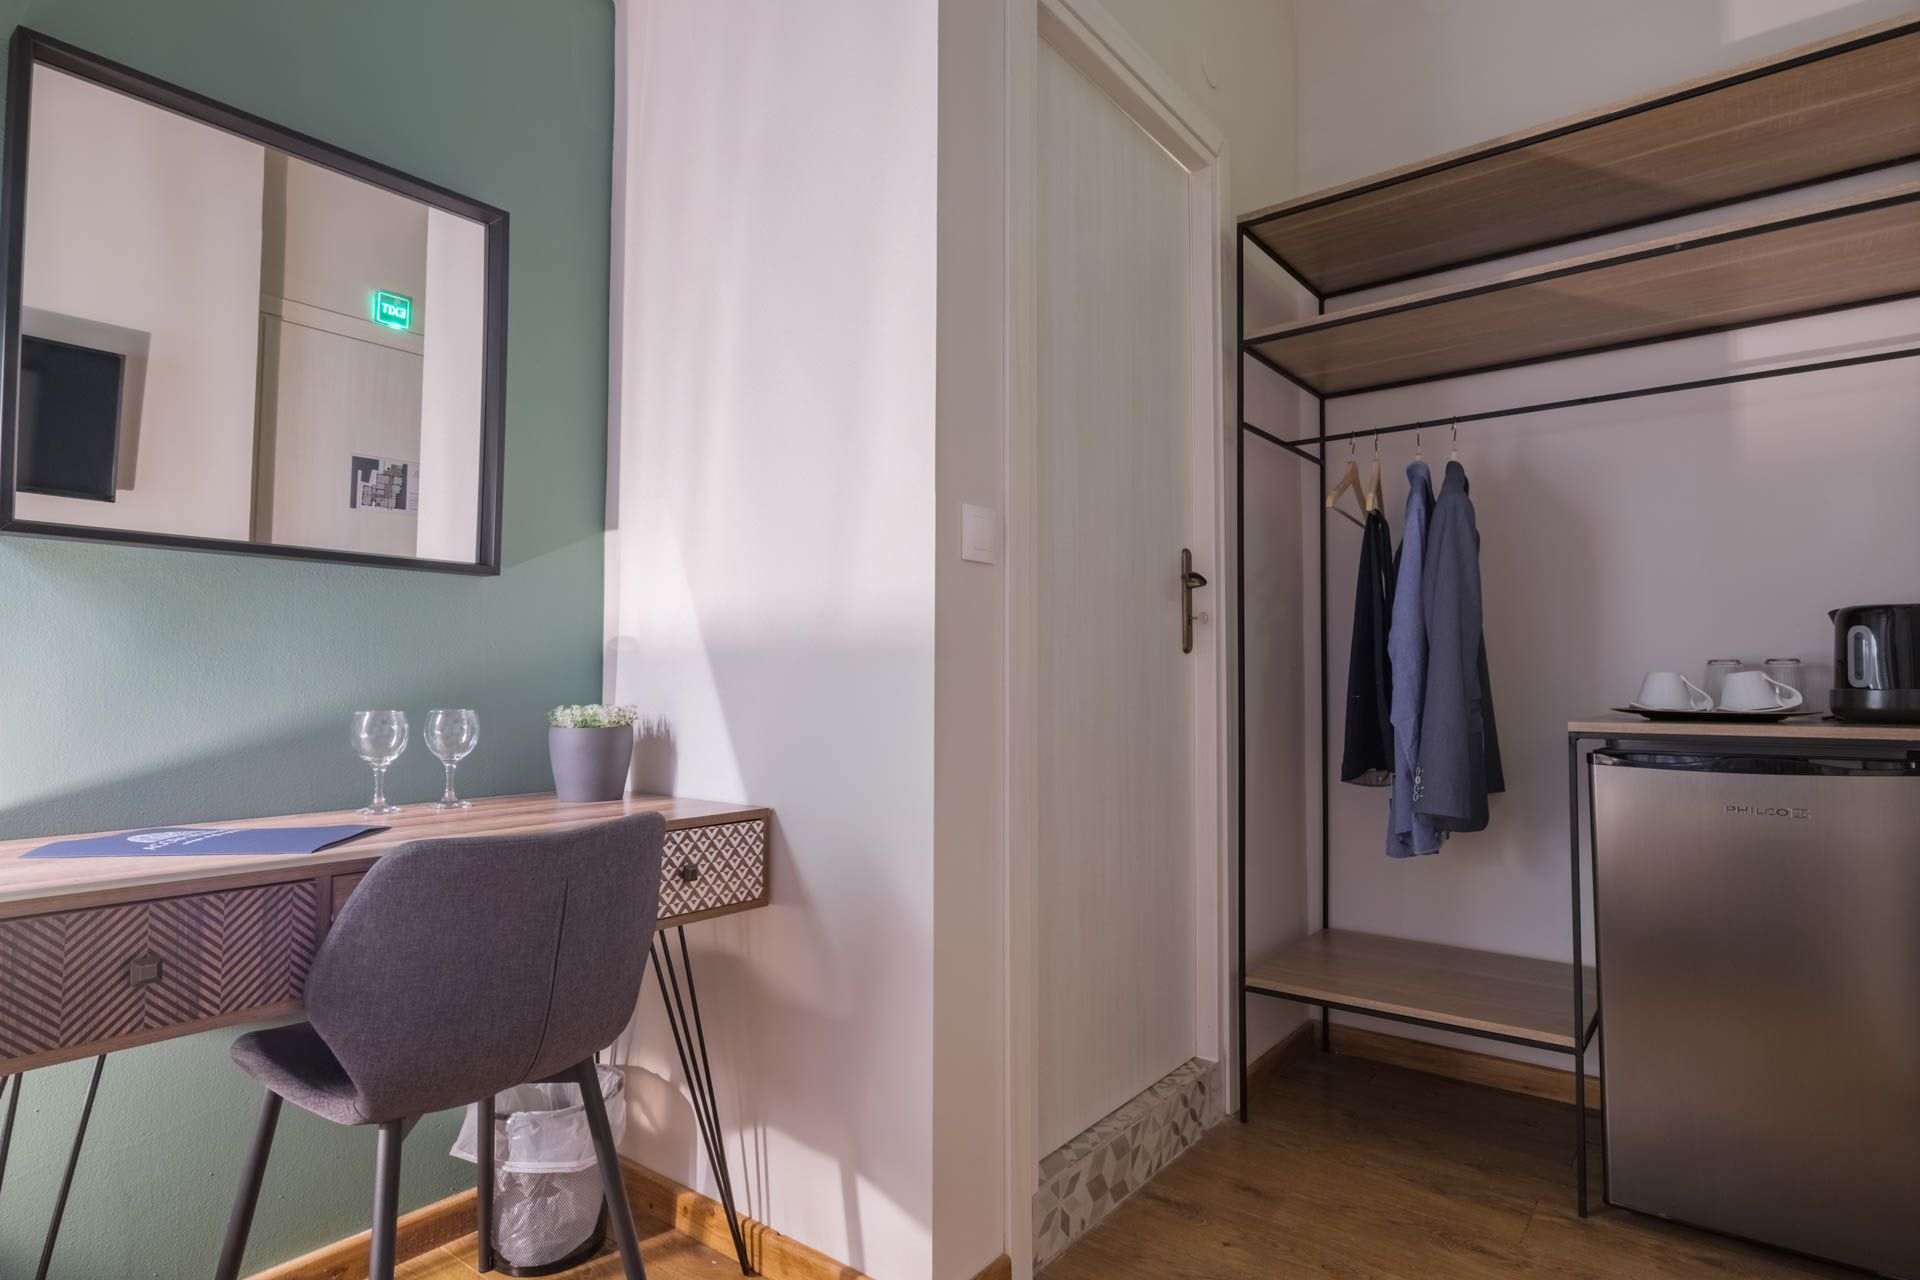 Agora Residence Chios - Χιος ✦ 2 Ημερες (1 Διανυκτερευση) ✦ 2 ατομα ✦ Χωρις Πρωινο ✦ εως 30/06/2020 ✦ Free WiFi